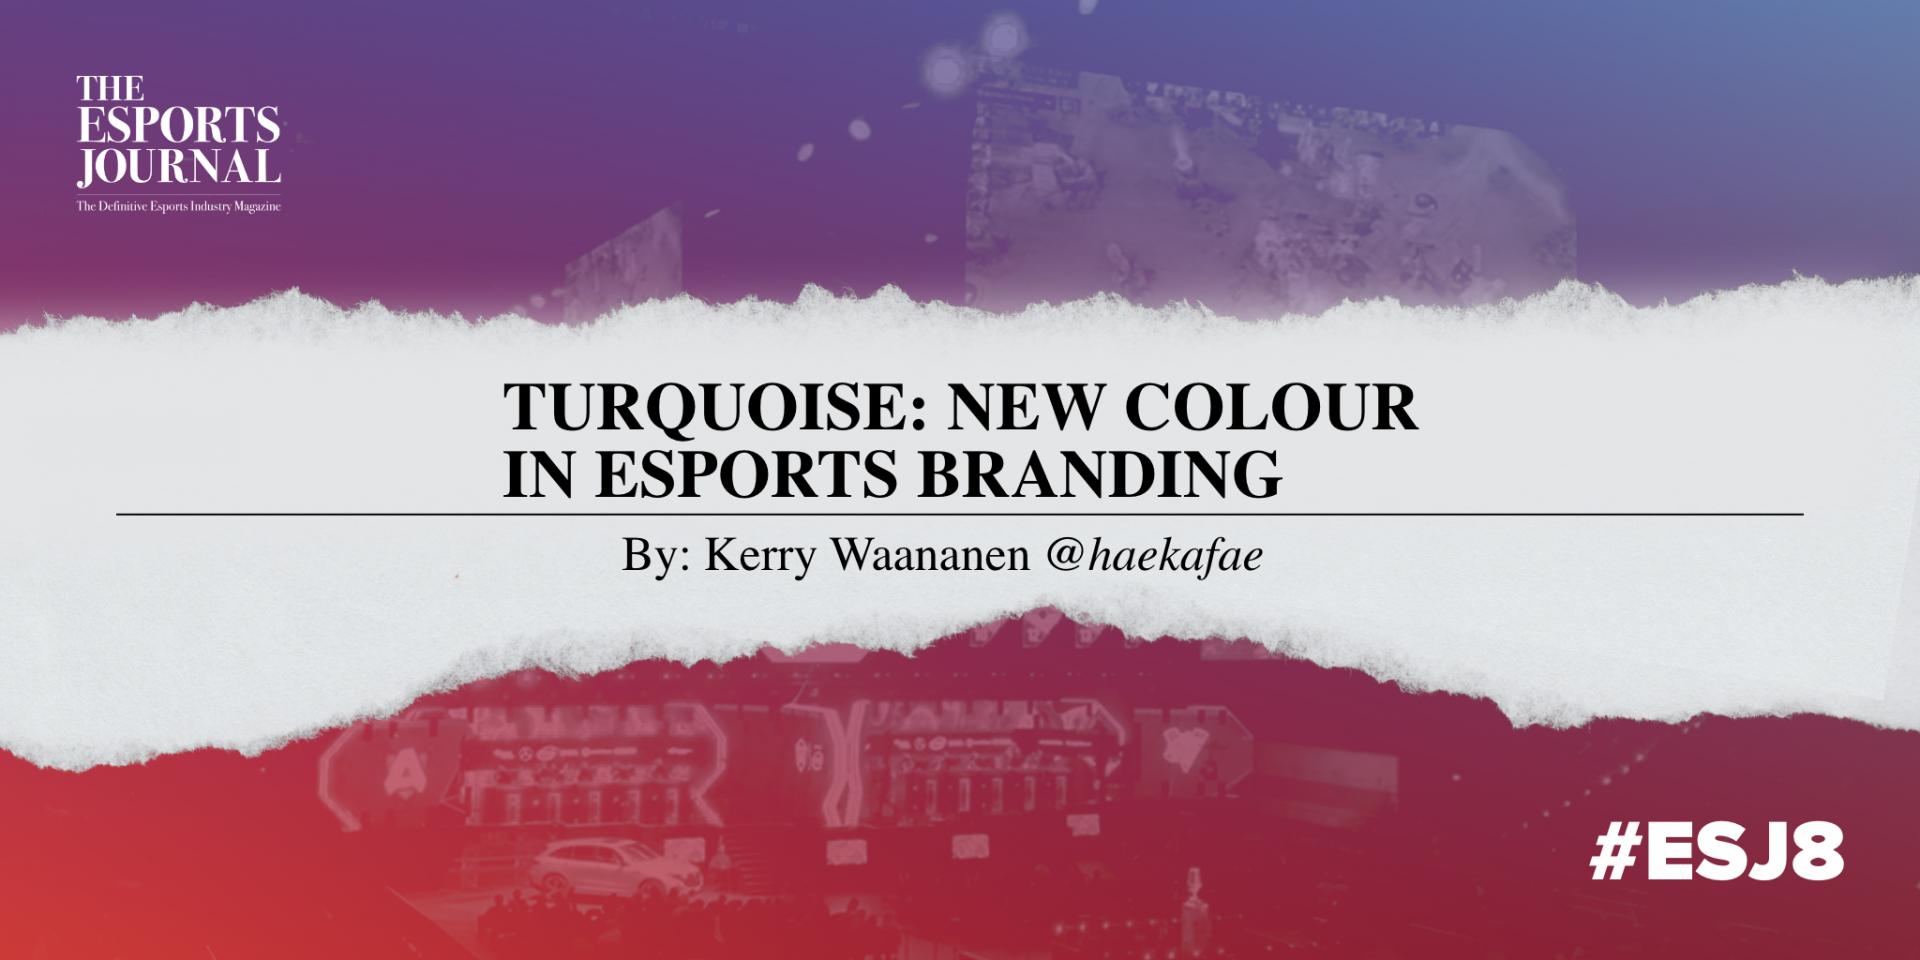 Turquoise Branding The Esports Journal